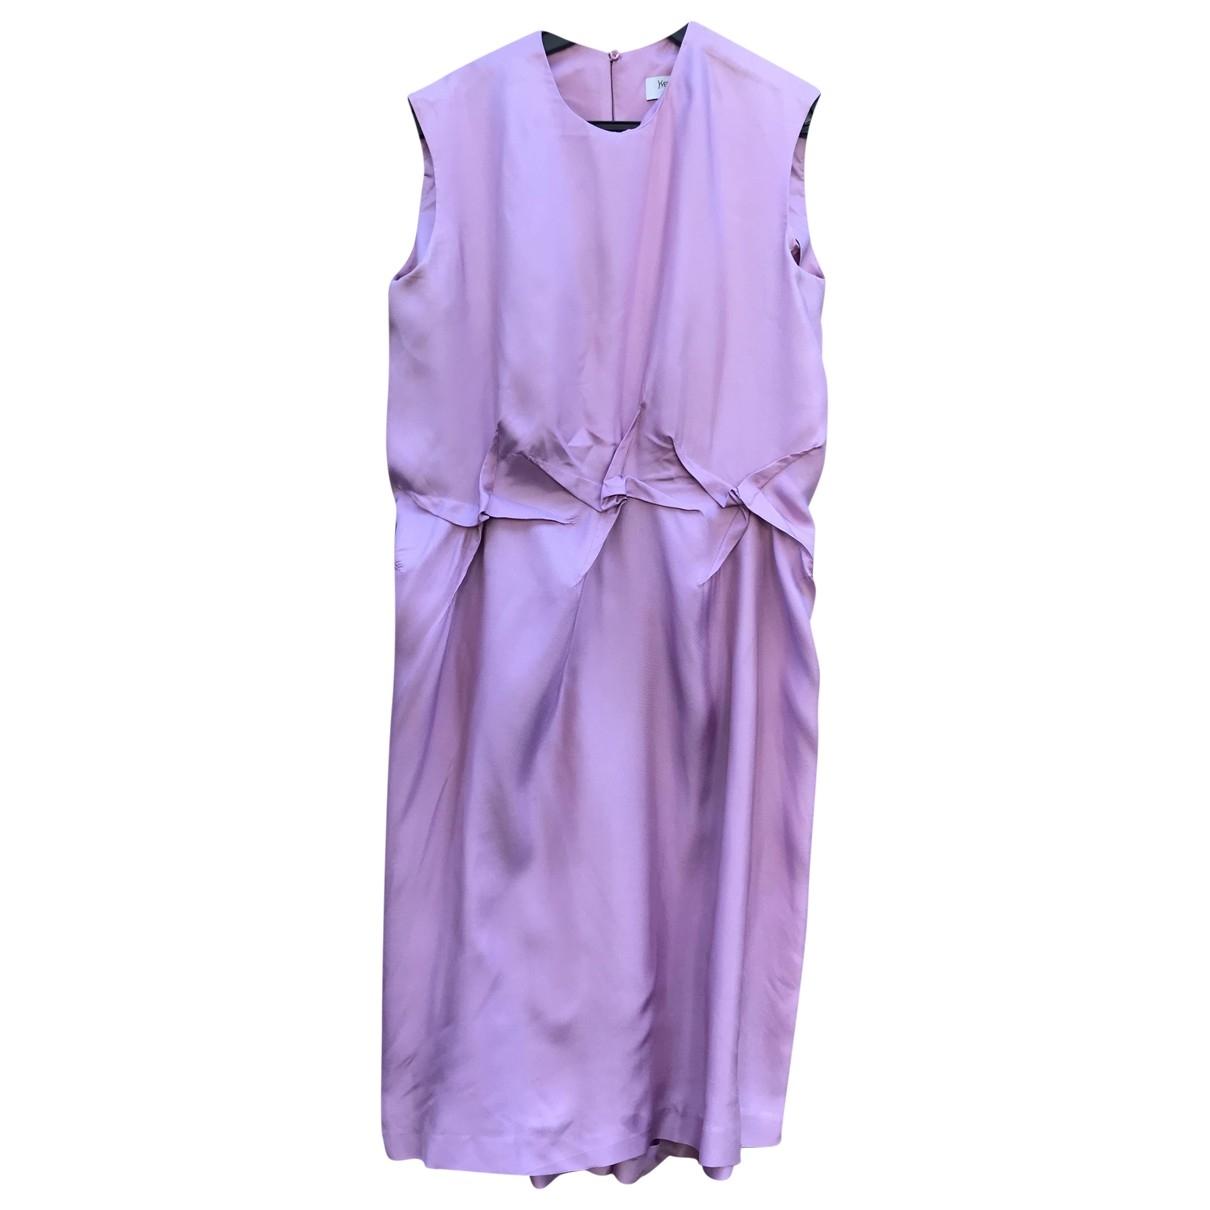 Yves Saint Laurent - Robe   pour femme en soie - rose